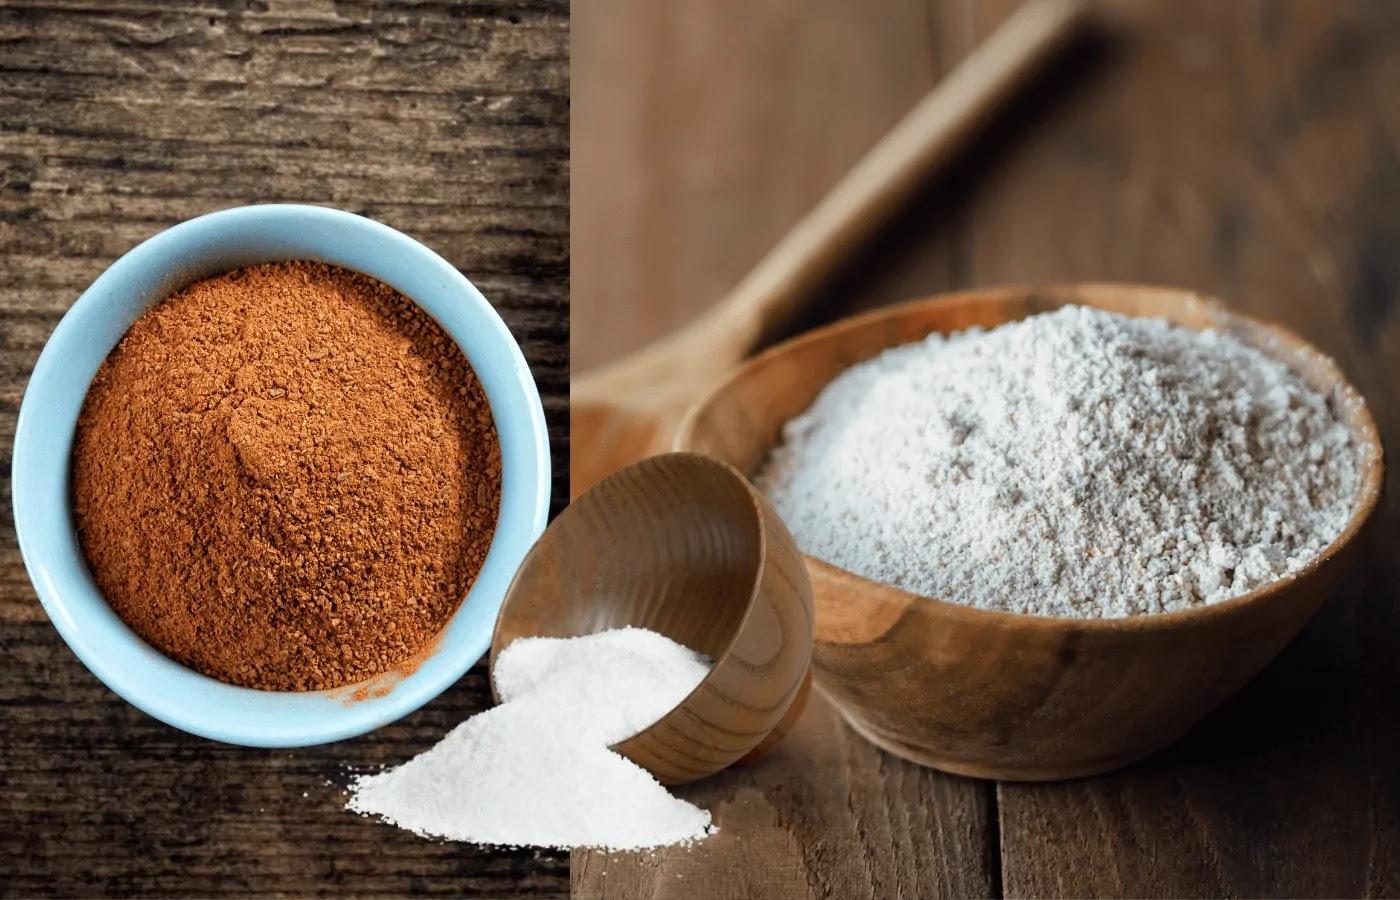 flour and cinnamon for Amish bread